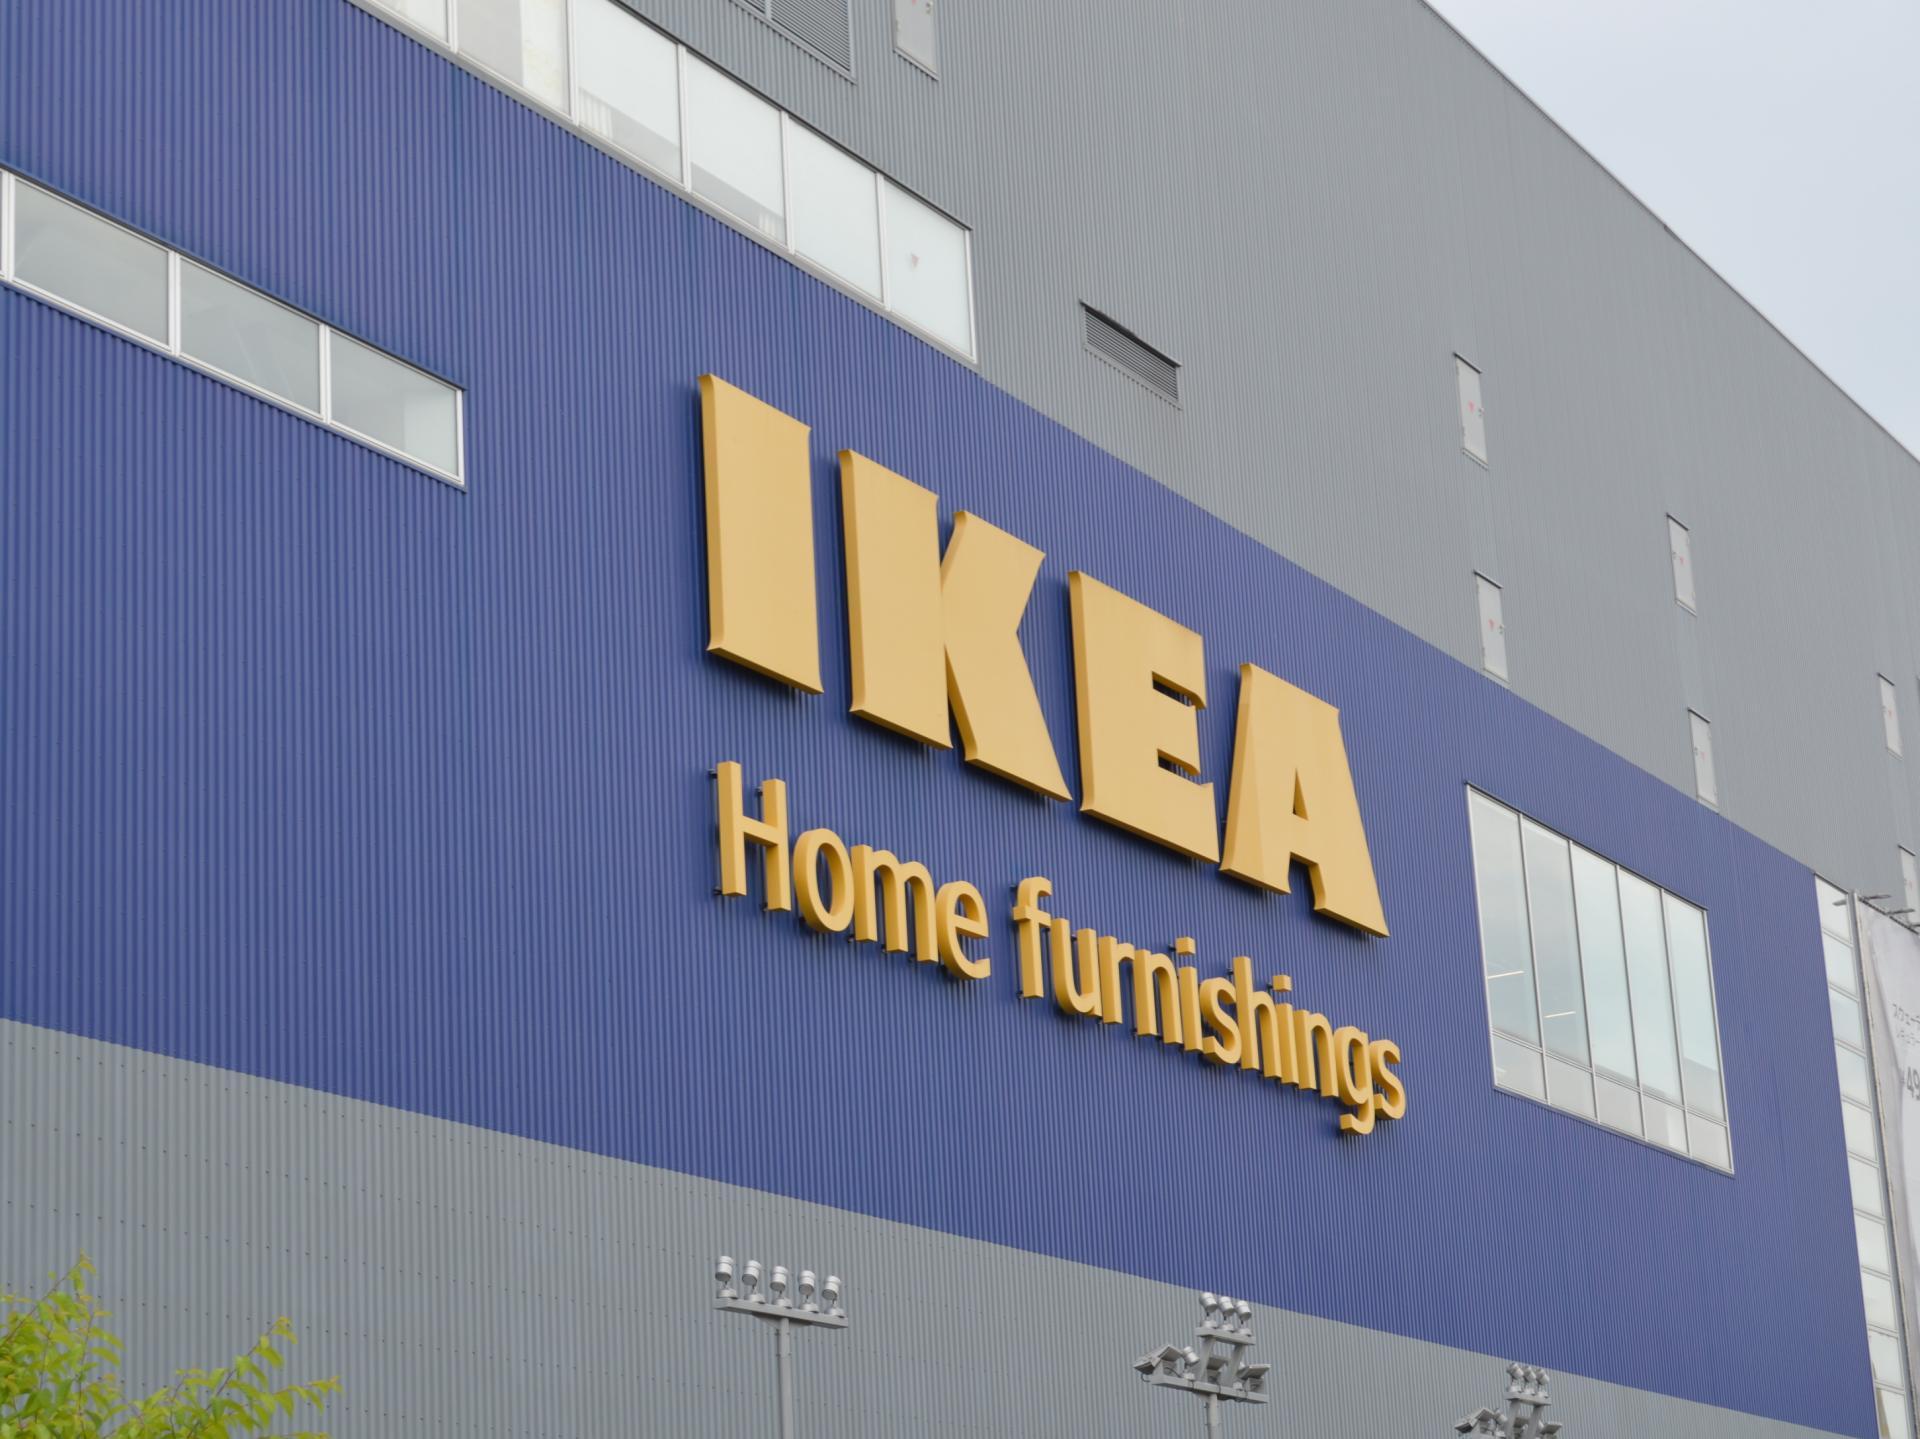 IKEAなら照明の種類が豊富!おしゃれでかわいいおすすめ商品をご紹介